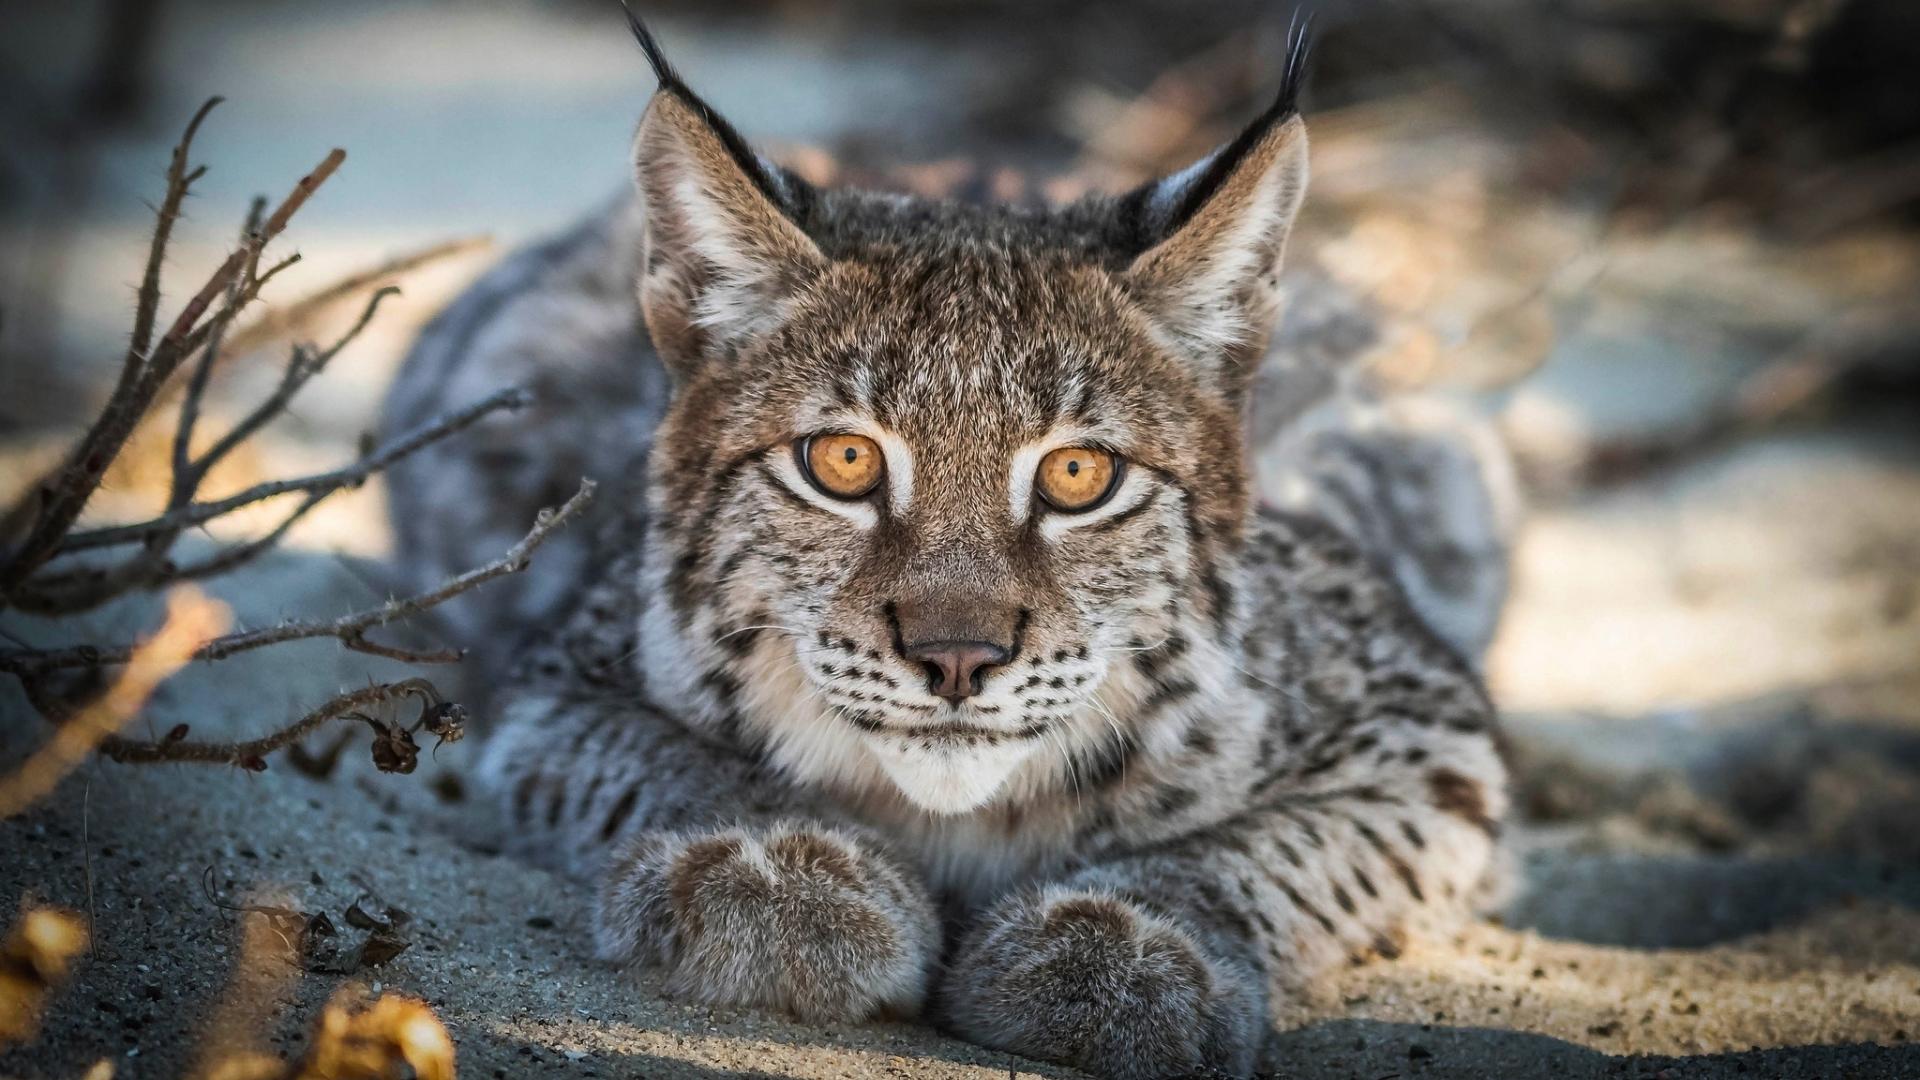 Close up, Lynx, cat, predator, muzzle, 1920x1080 wallpaper